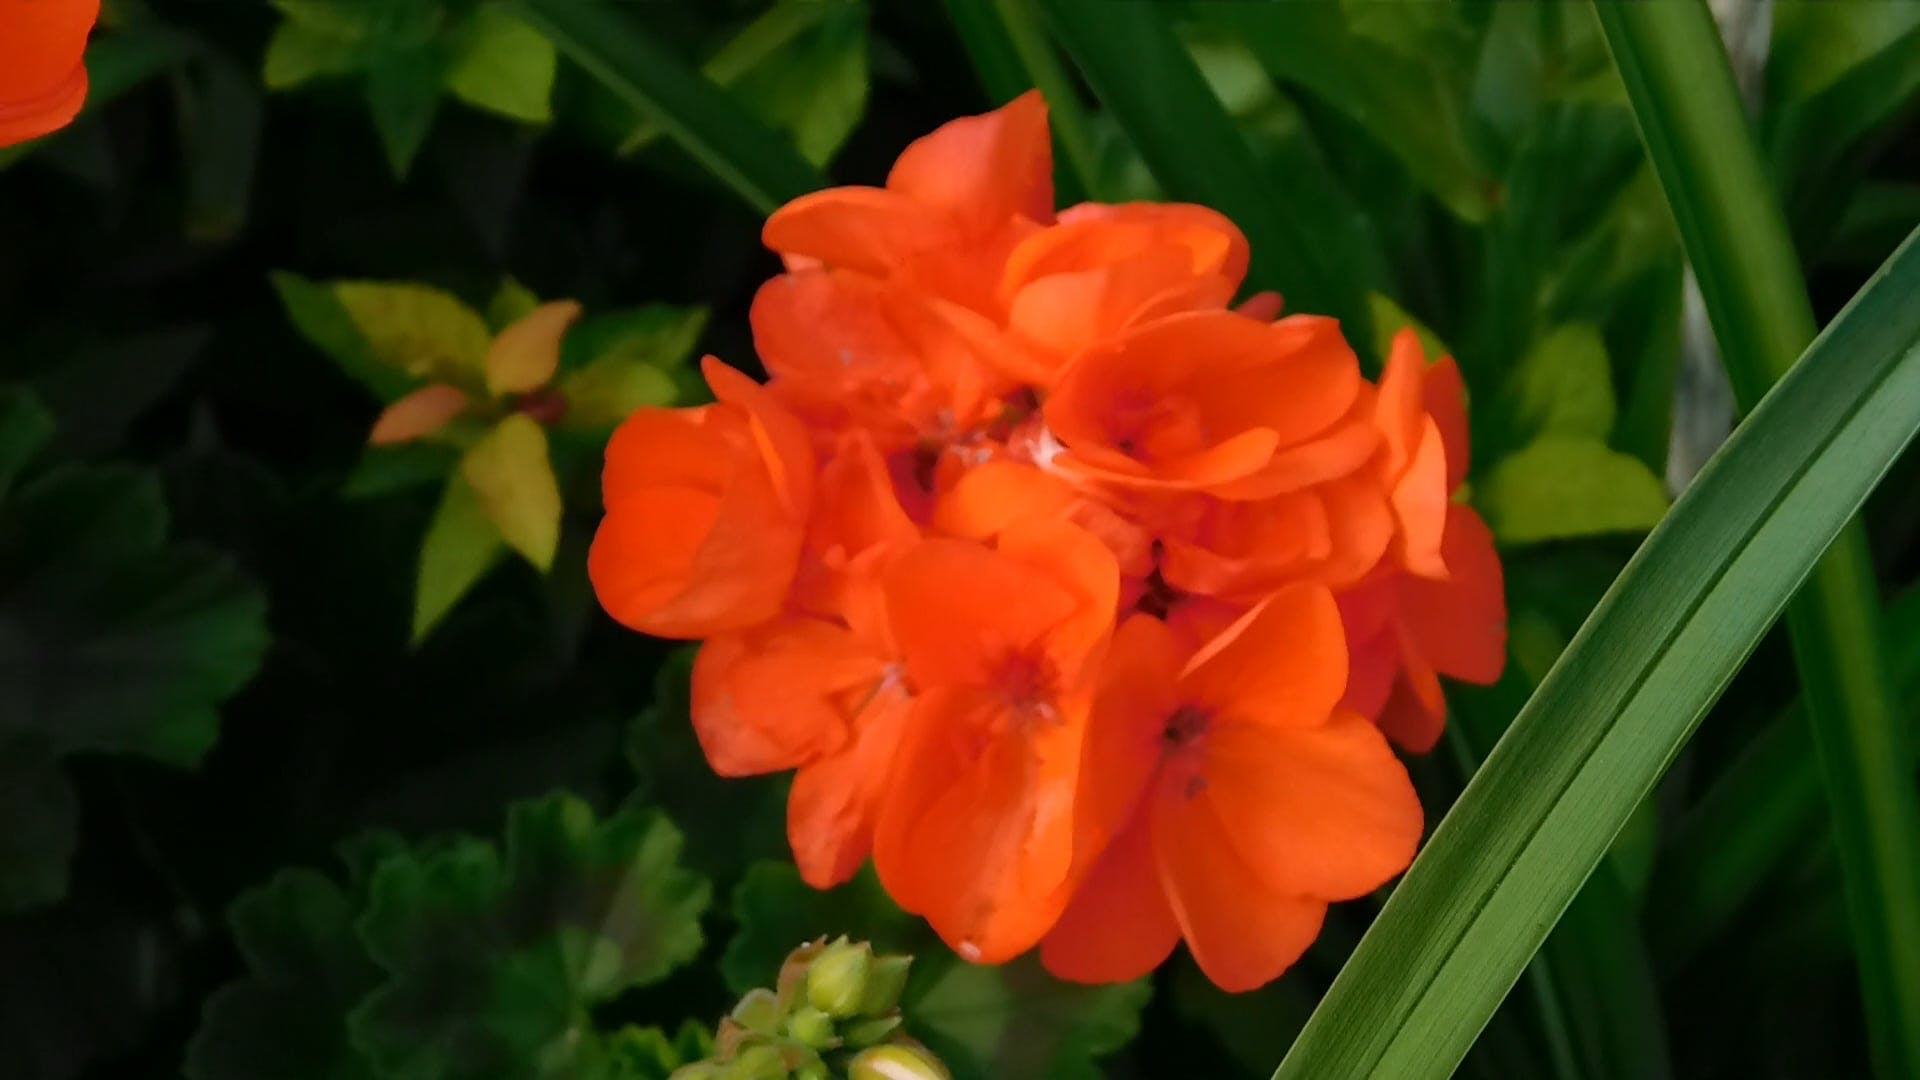 Close-Up Video Of Orange Flowers